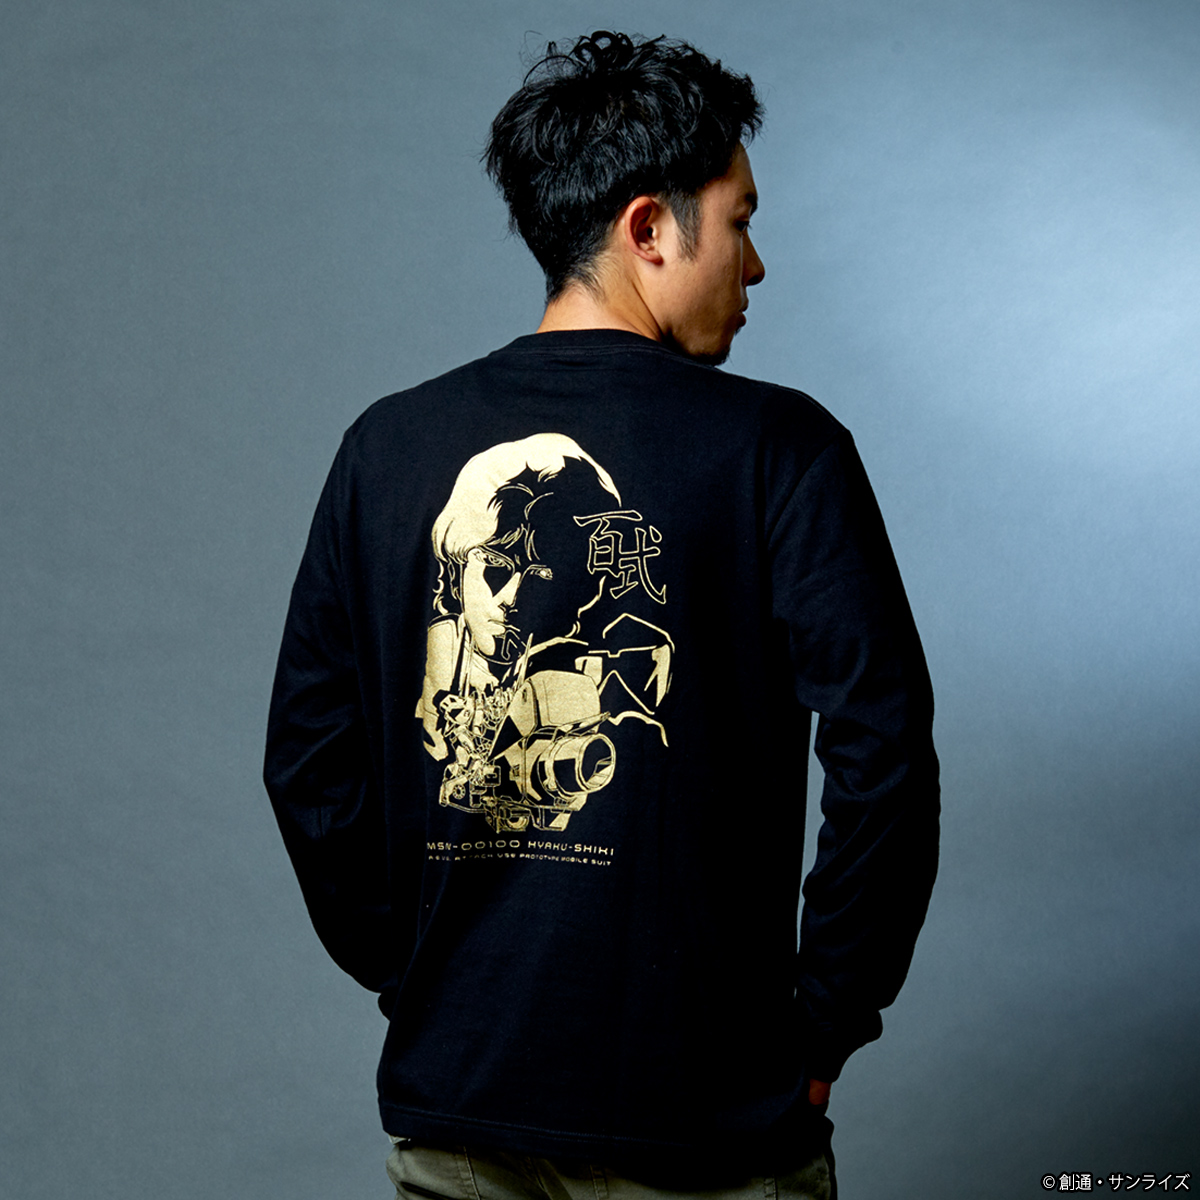 STRICT-G『機動戦士Zガンダム』長袖Tシャツ クワトロ・バジーナ